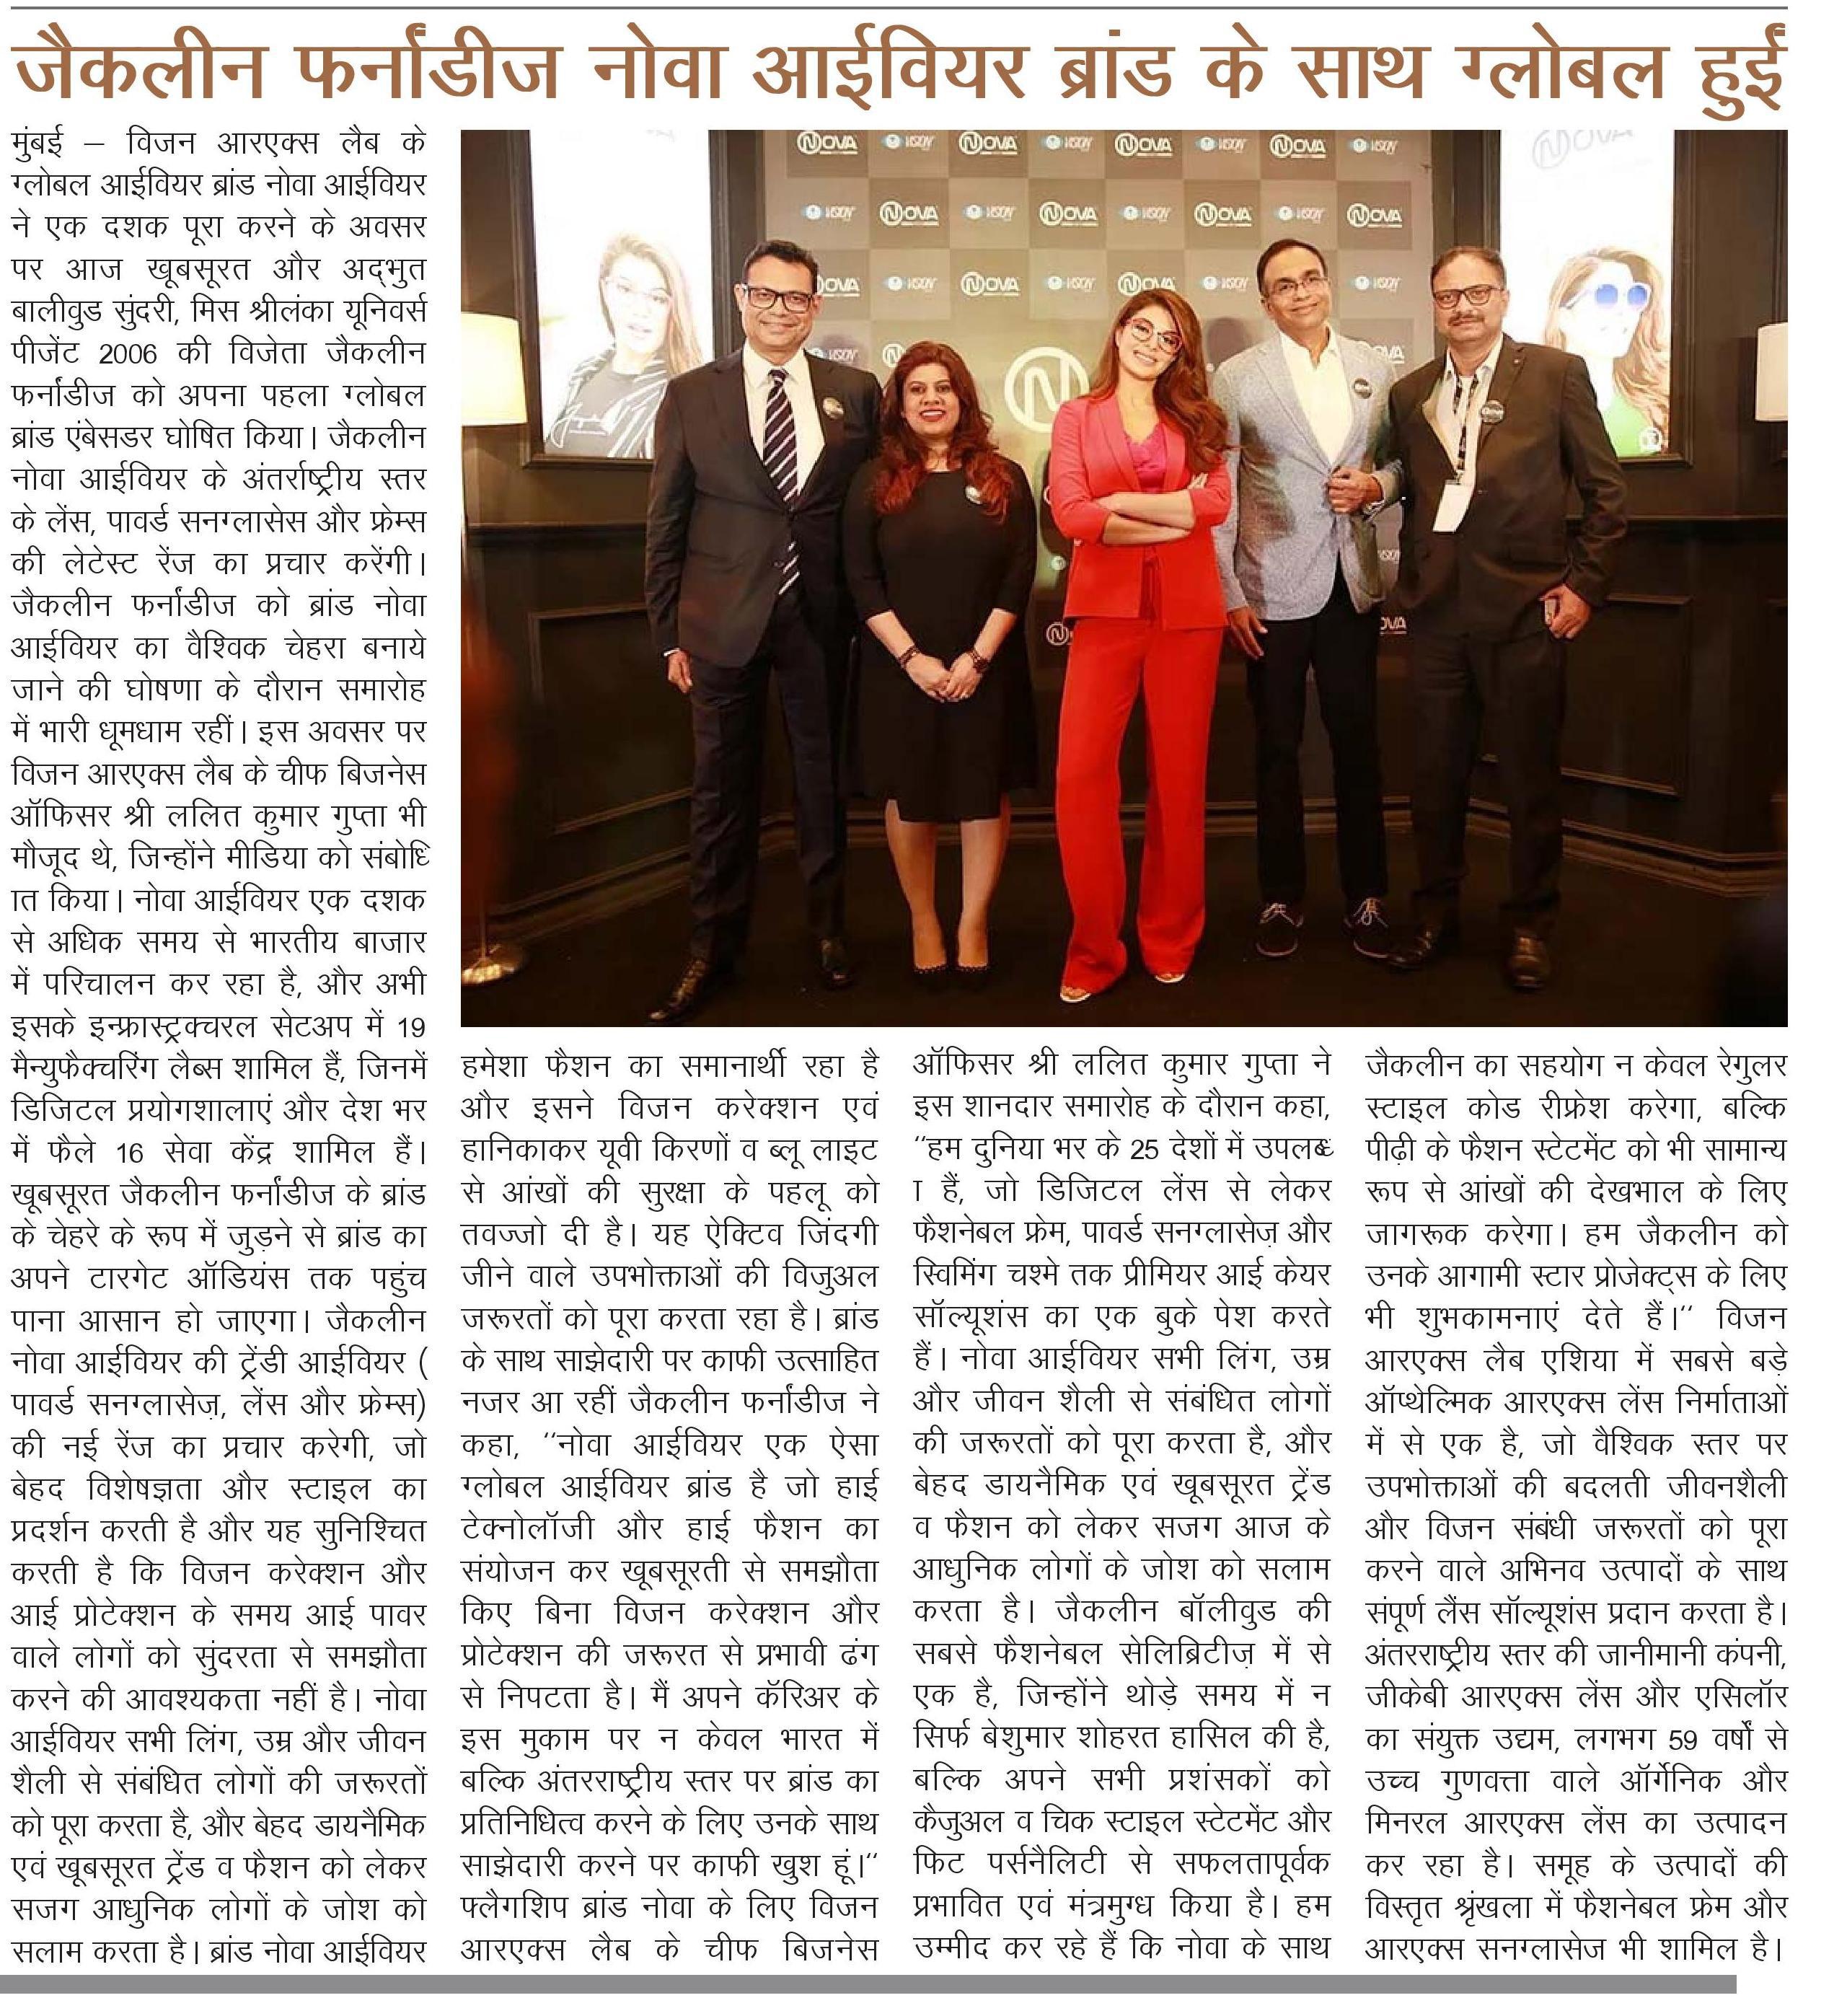 Jacqueline Fernandez announced as the brand ambassador of Nova eyewear